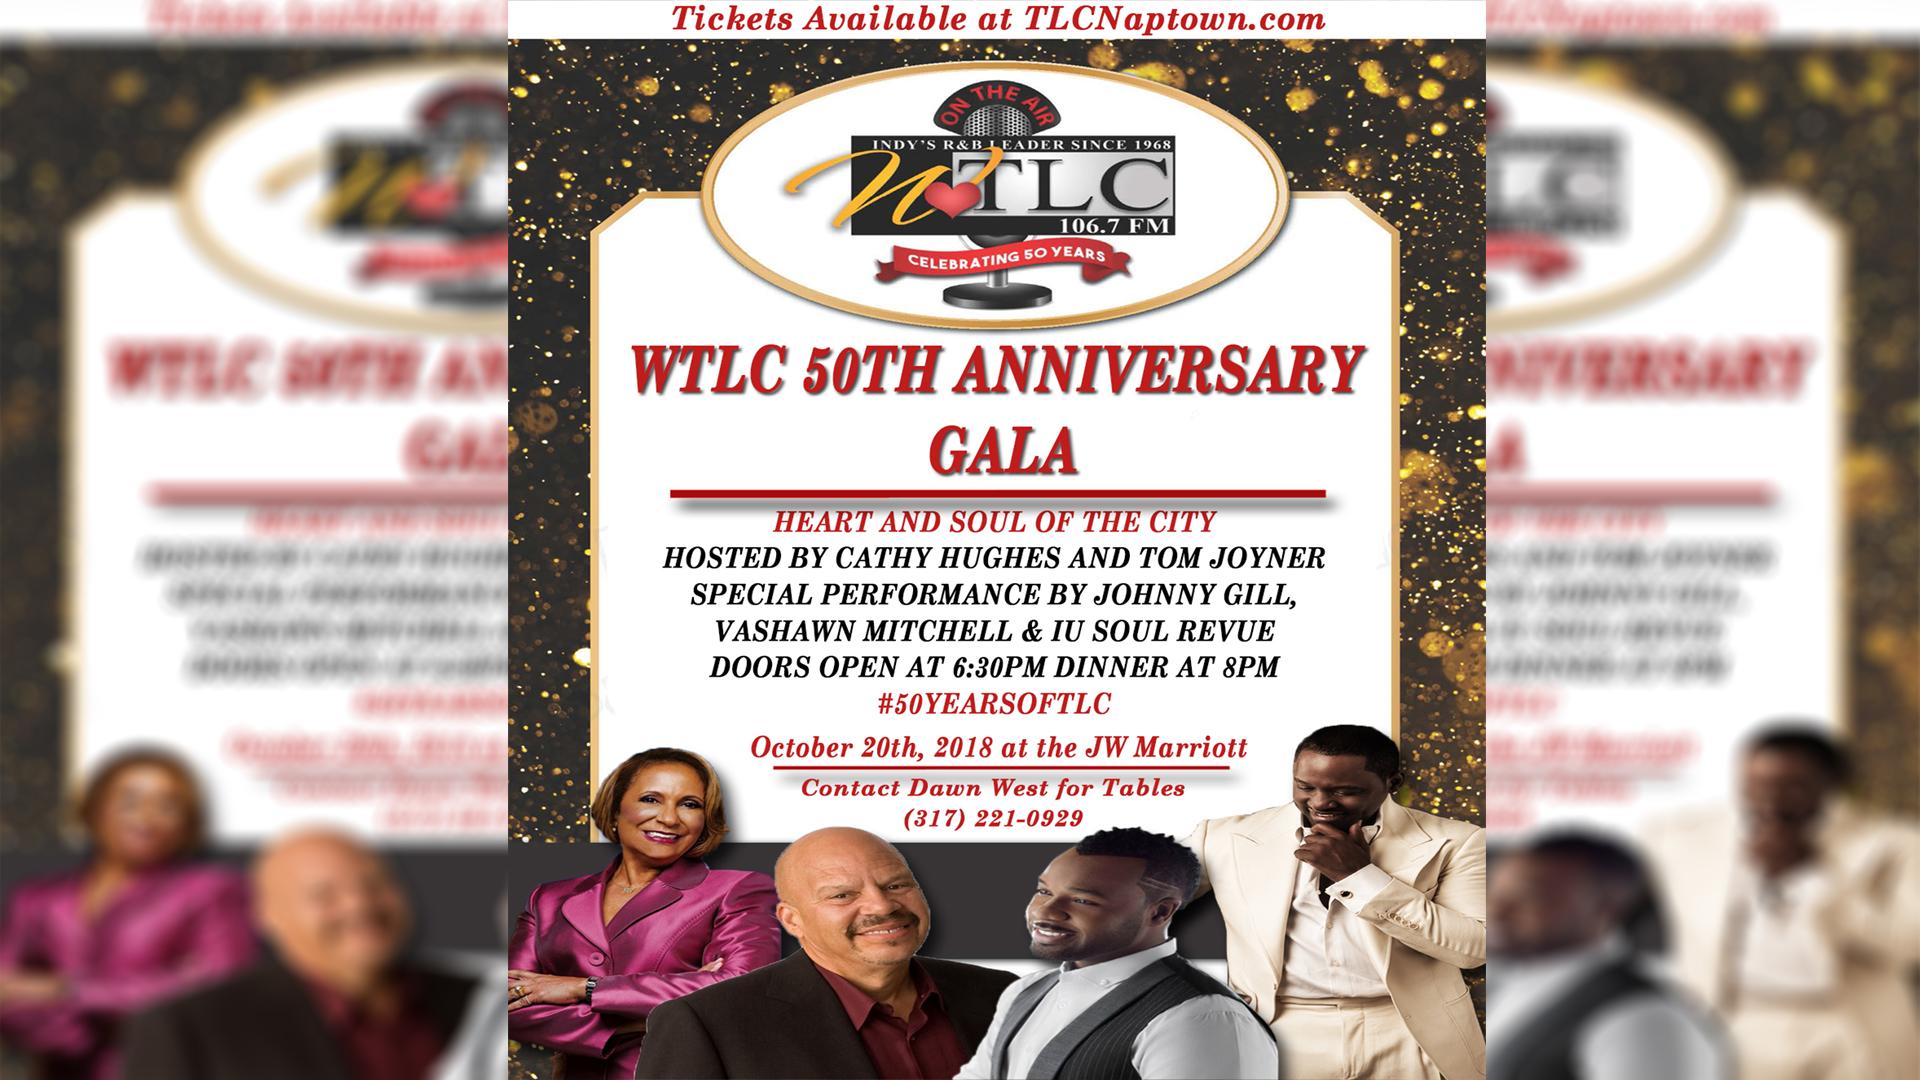 WTLC's 50th Anniversary Gala Flyer